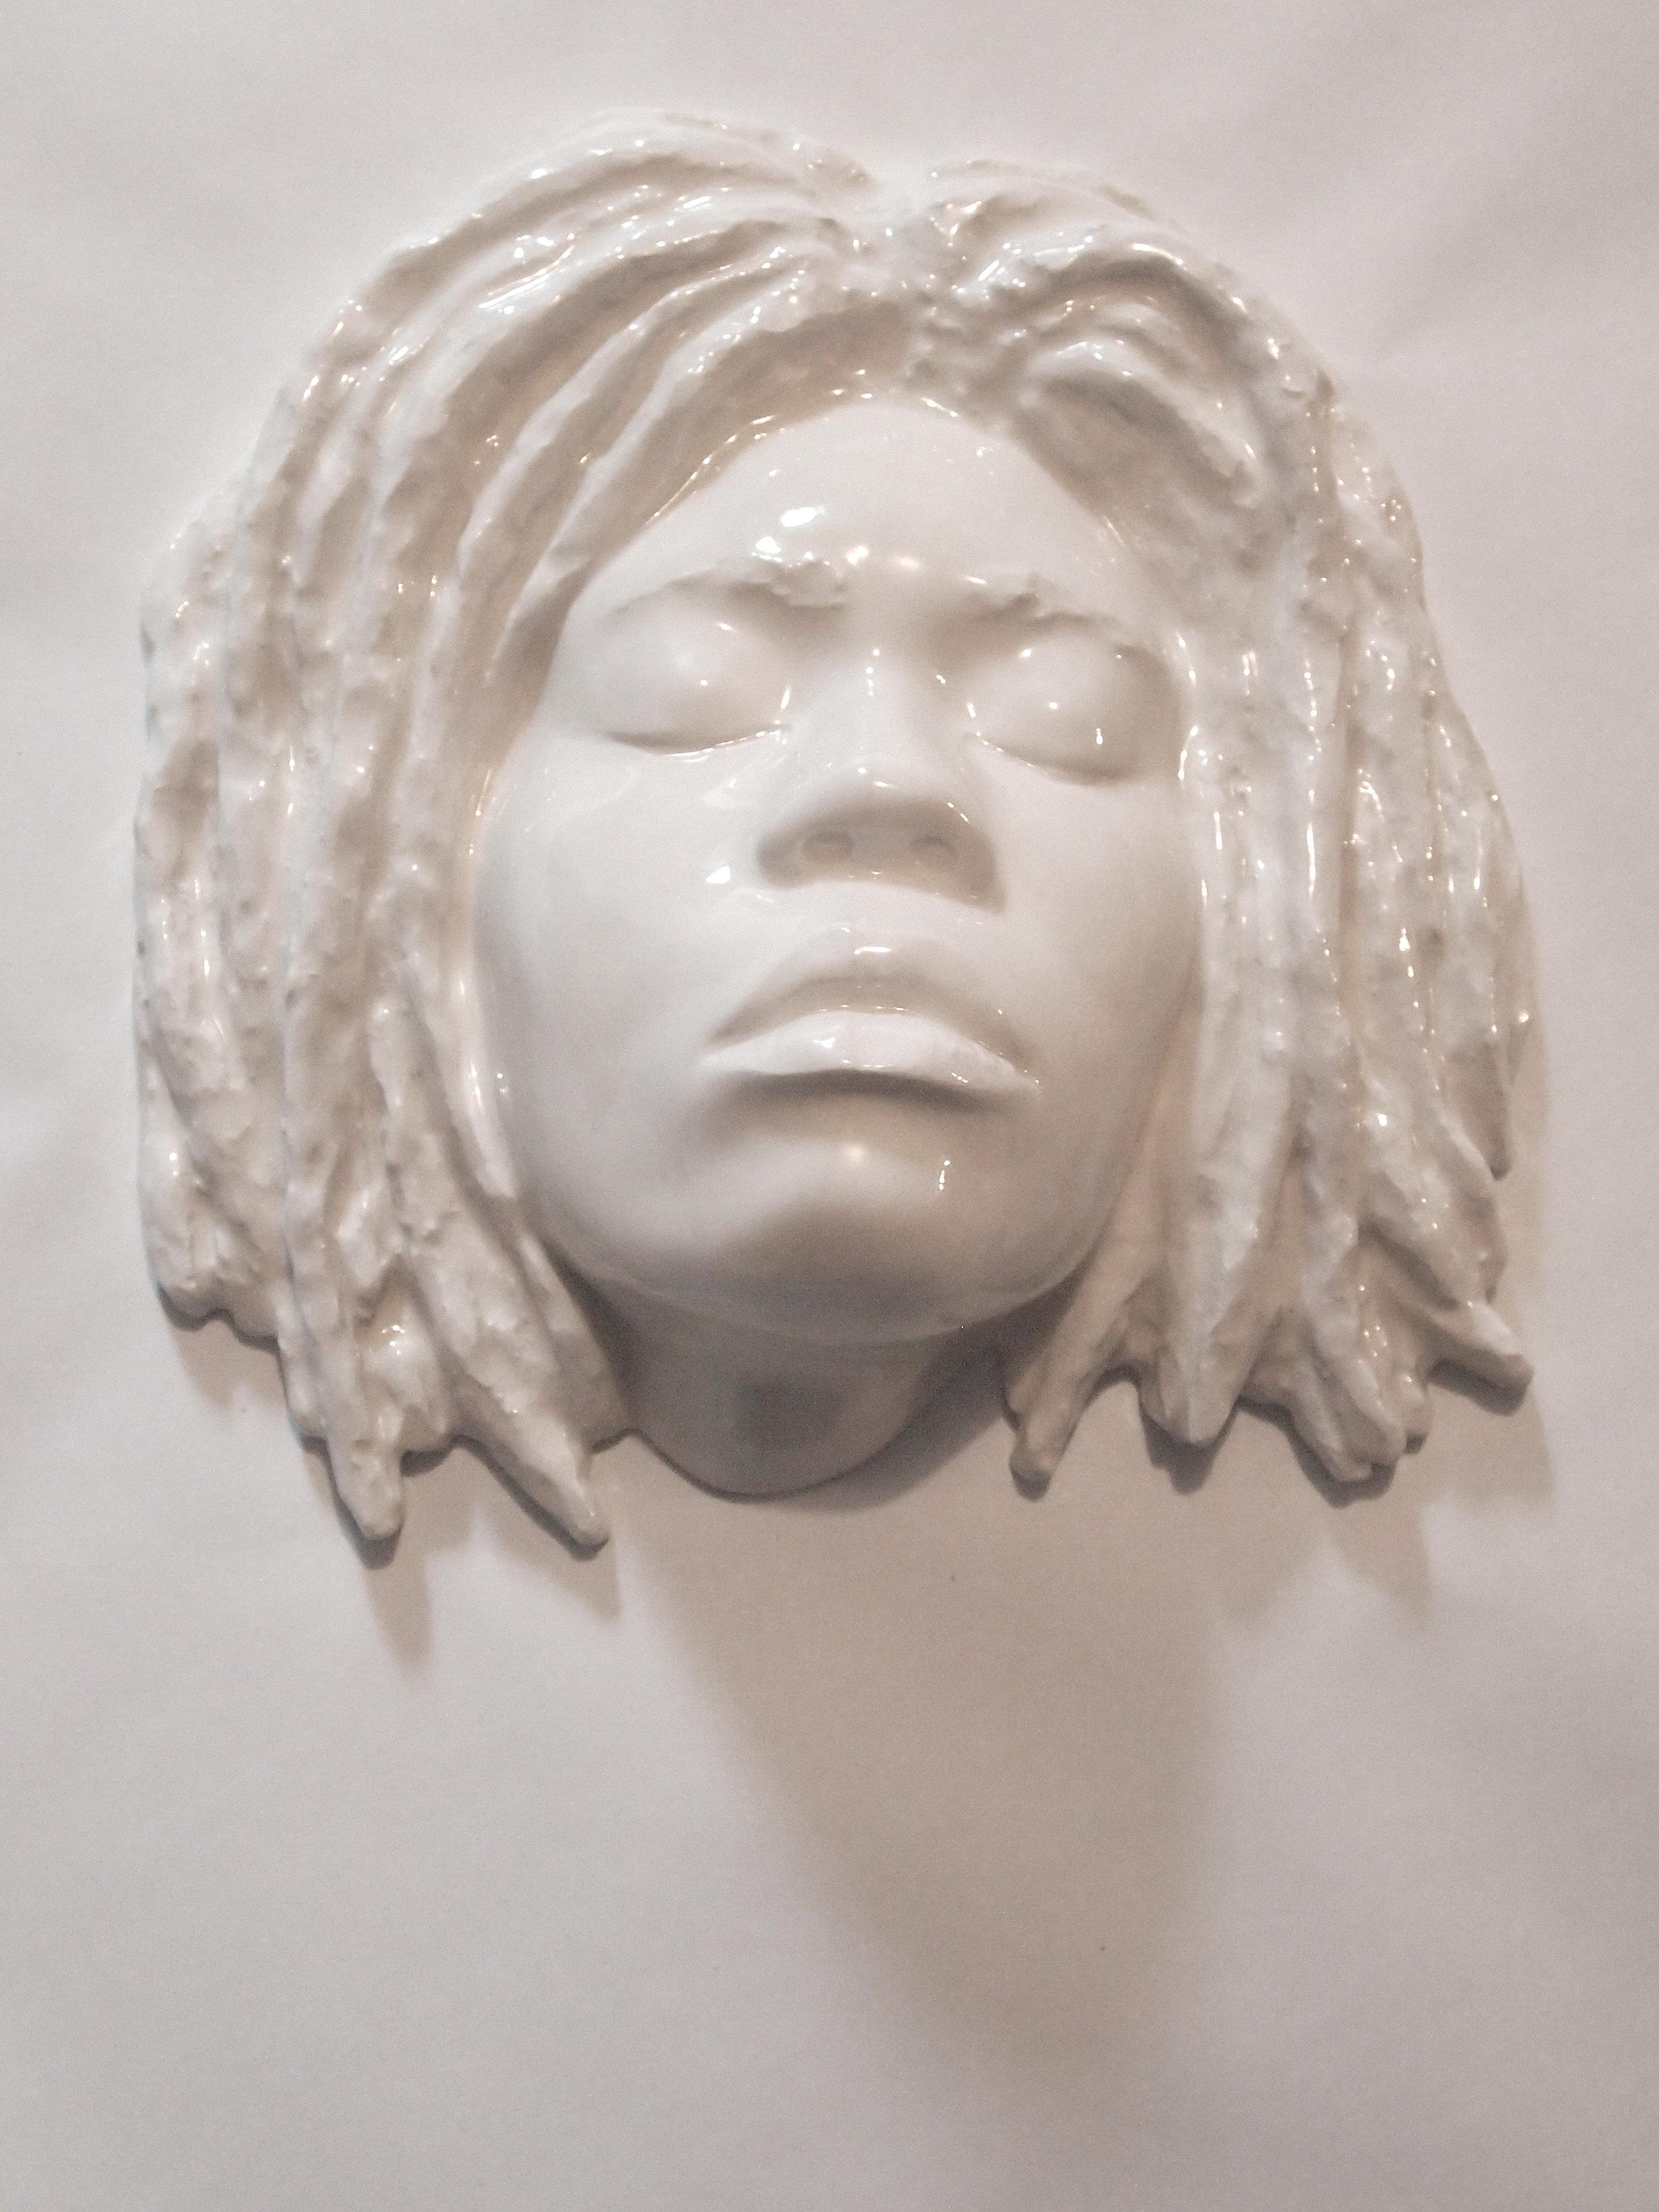 Craig Paul Nowak art ceramic face sculpture